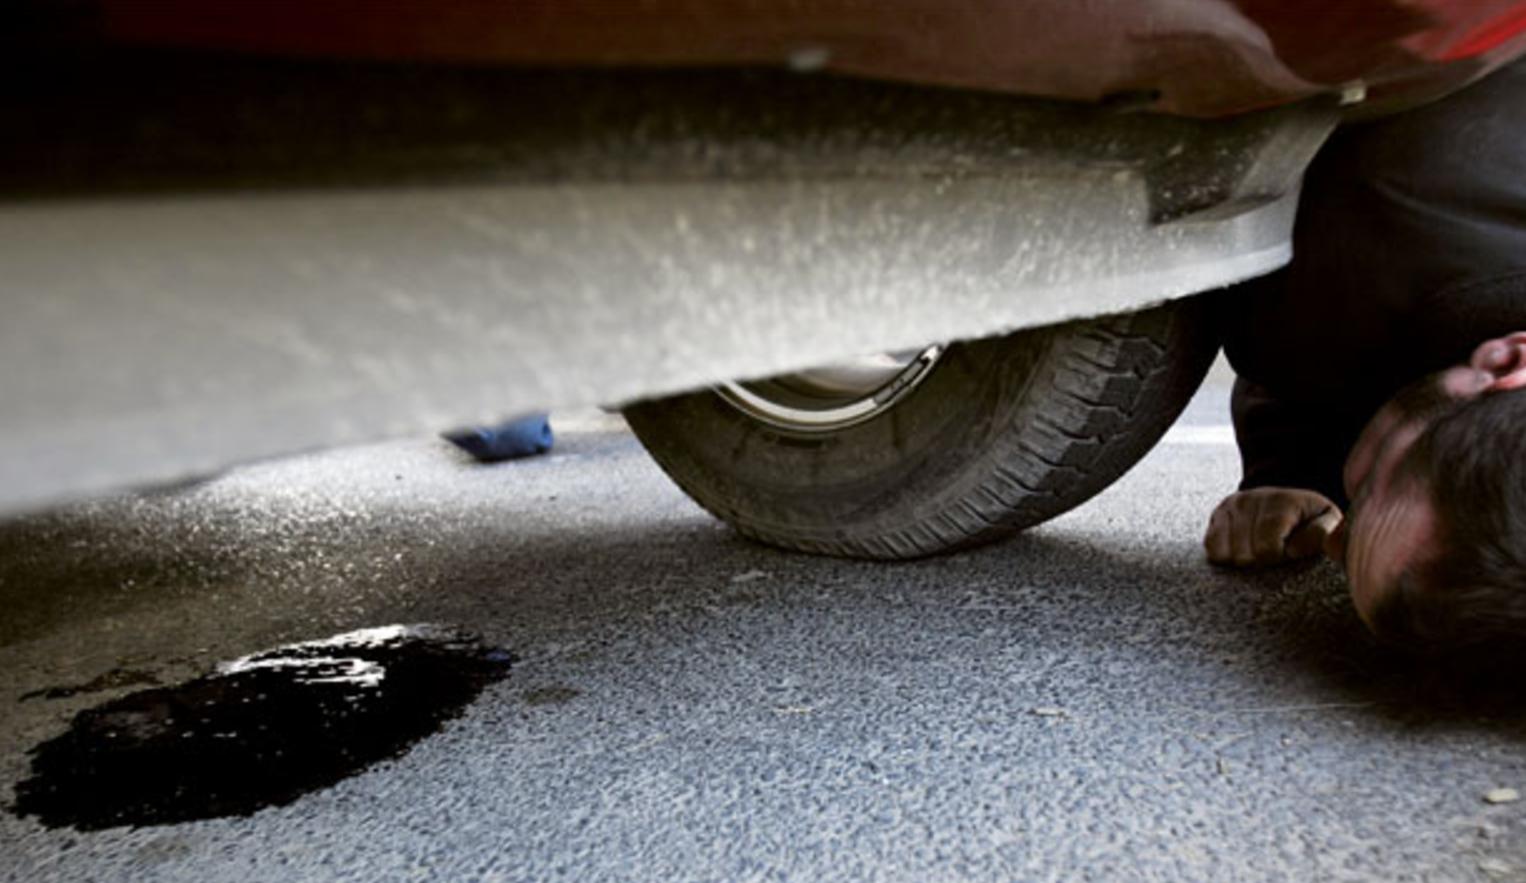 Common Vehicle Fluid Leaks | Discount Tire & Service Centers